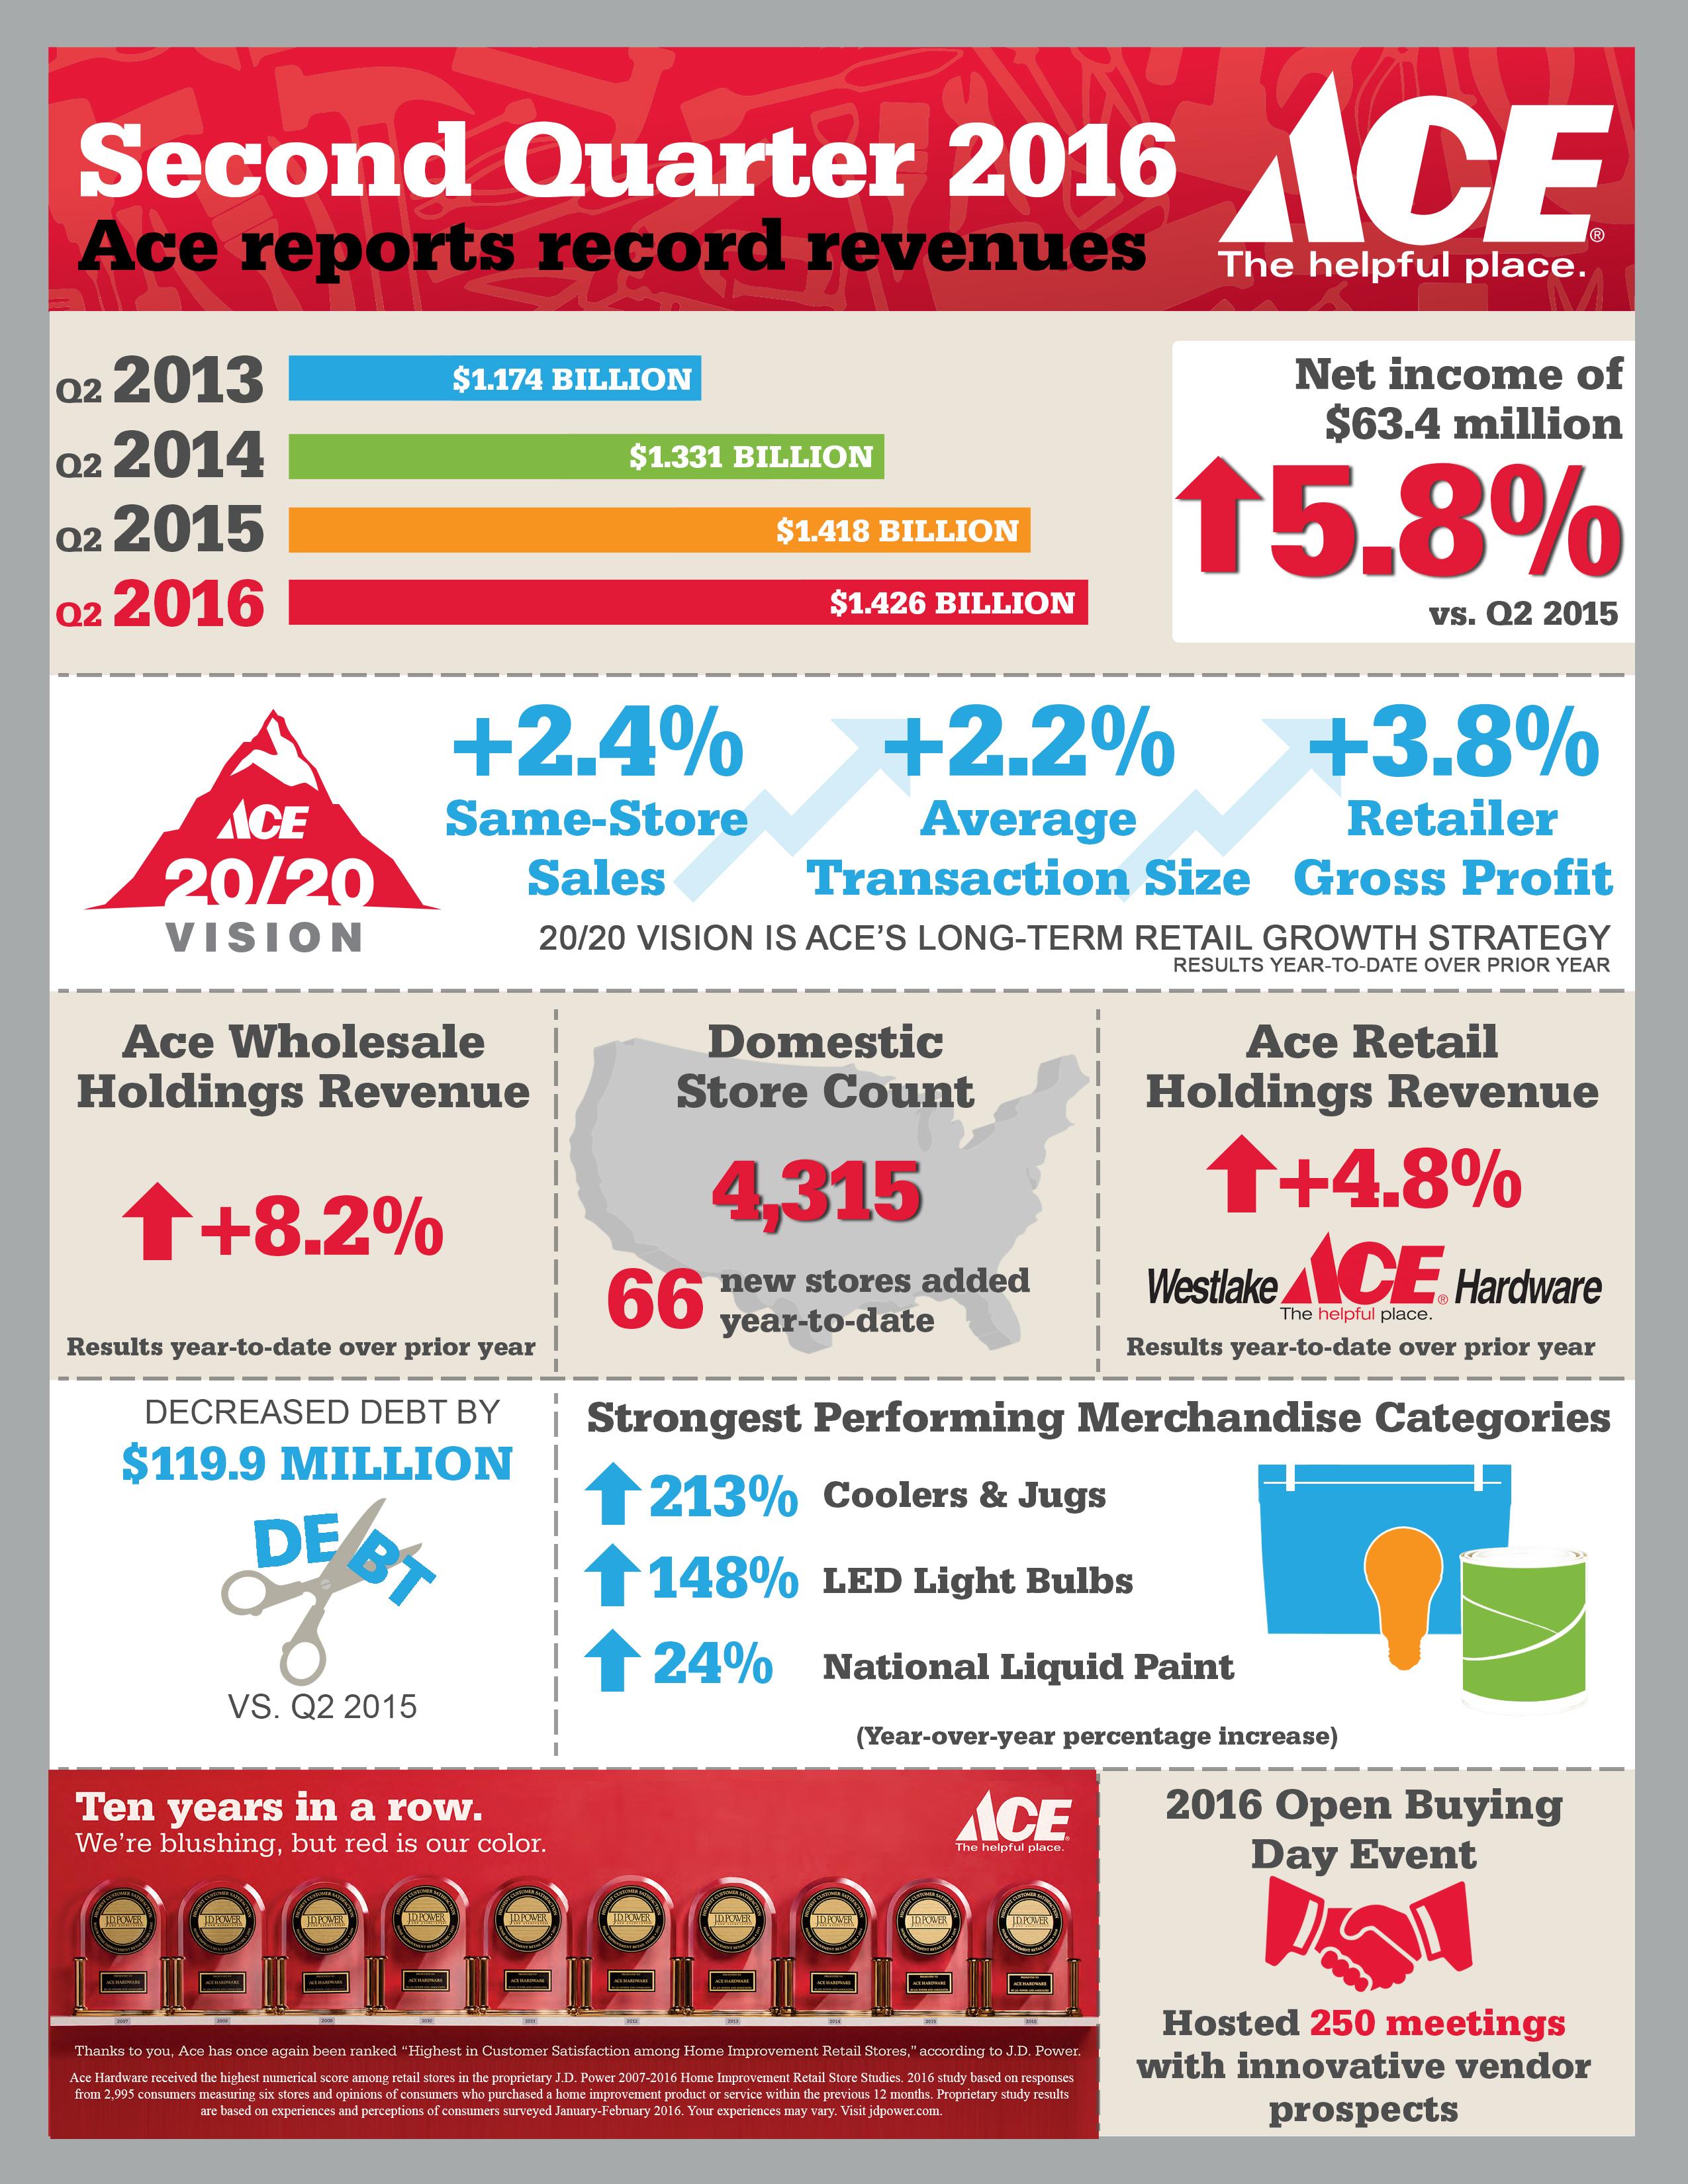 Ace Hardware Reports Second Quarter 2016 Revenues and Profits ...